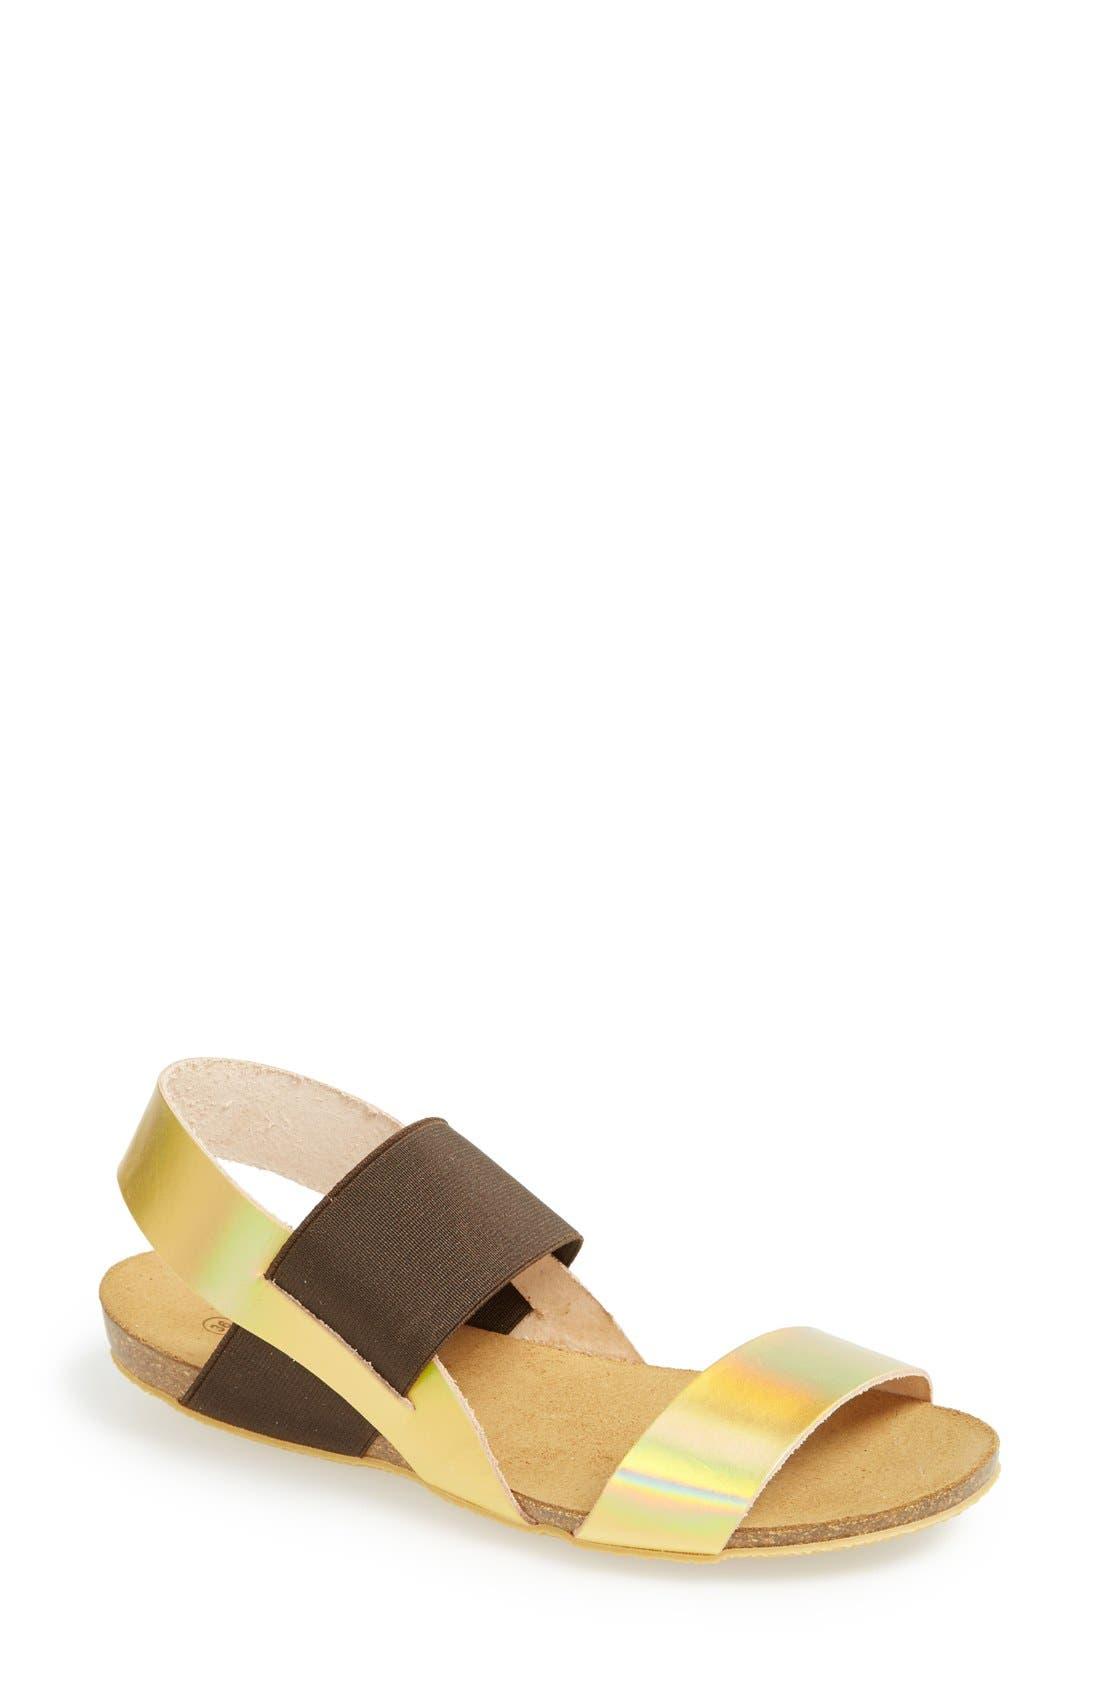 Alternate Image 1 Selected - MTNG Originals 'Annie' Colorblock Sandal